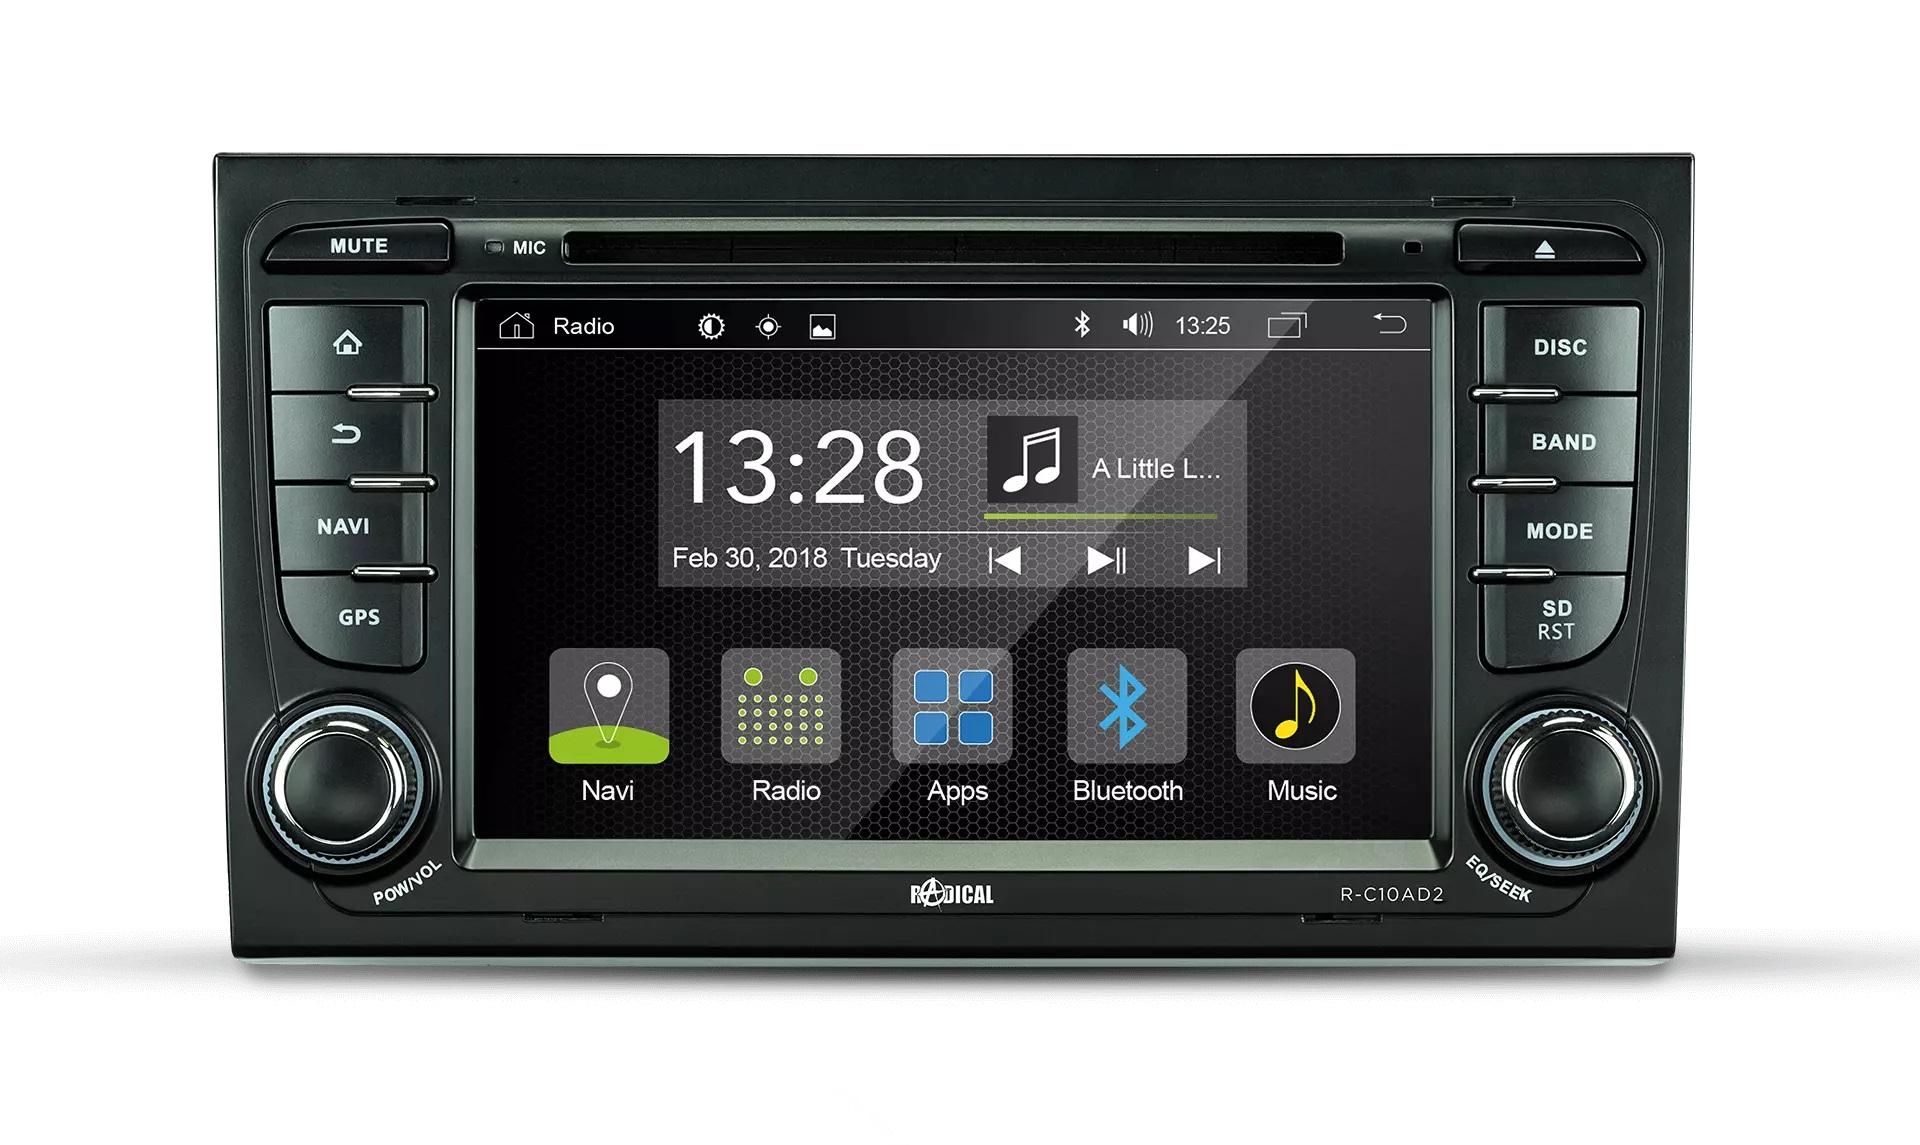 RADICAL R-C11AD2 Audi A4 Infotainment Android 9.0 2 DIN utoradio für Audi A4